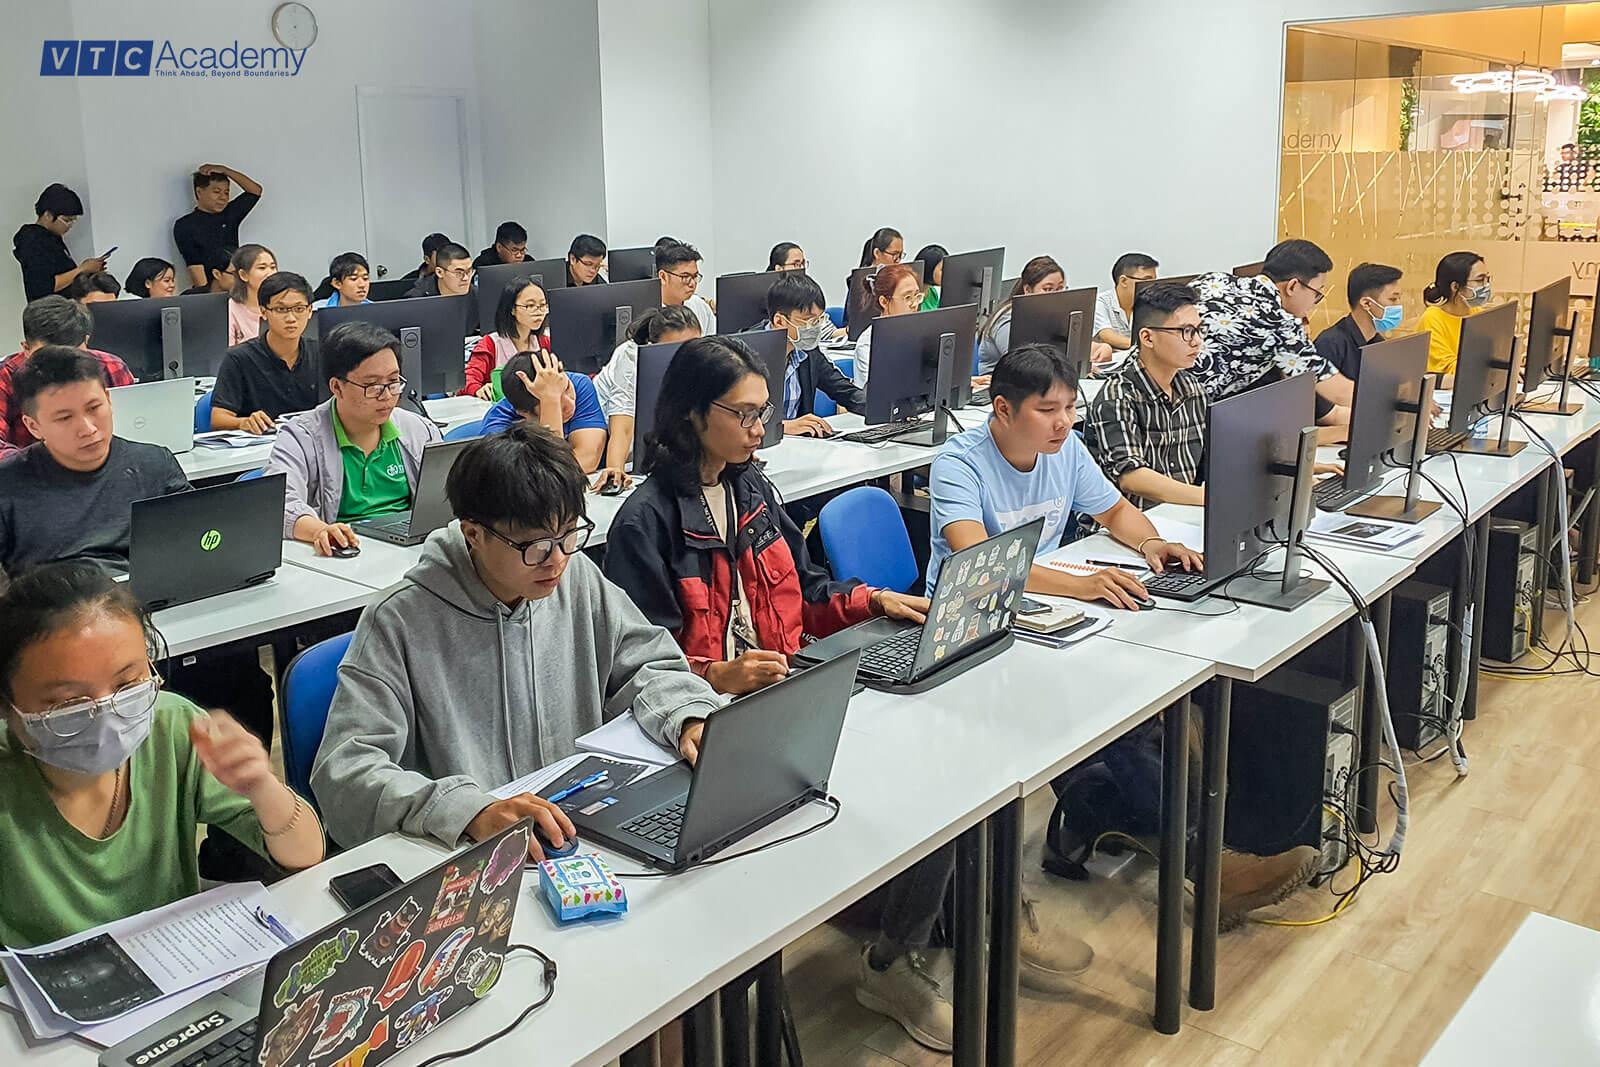 3d-modeling-bootcamp-vtc-academy-2